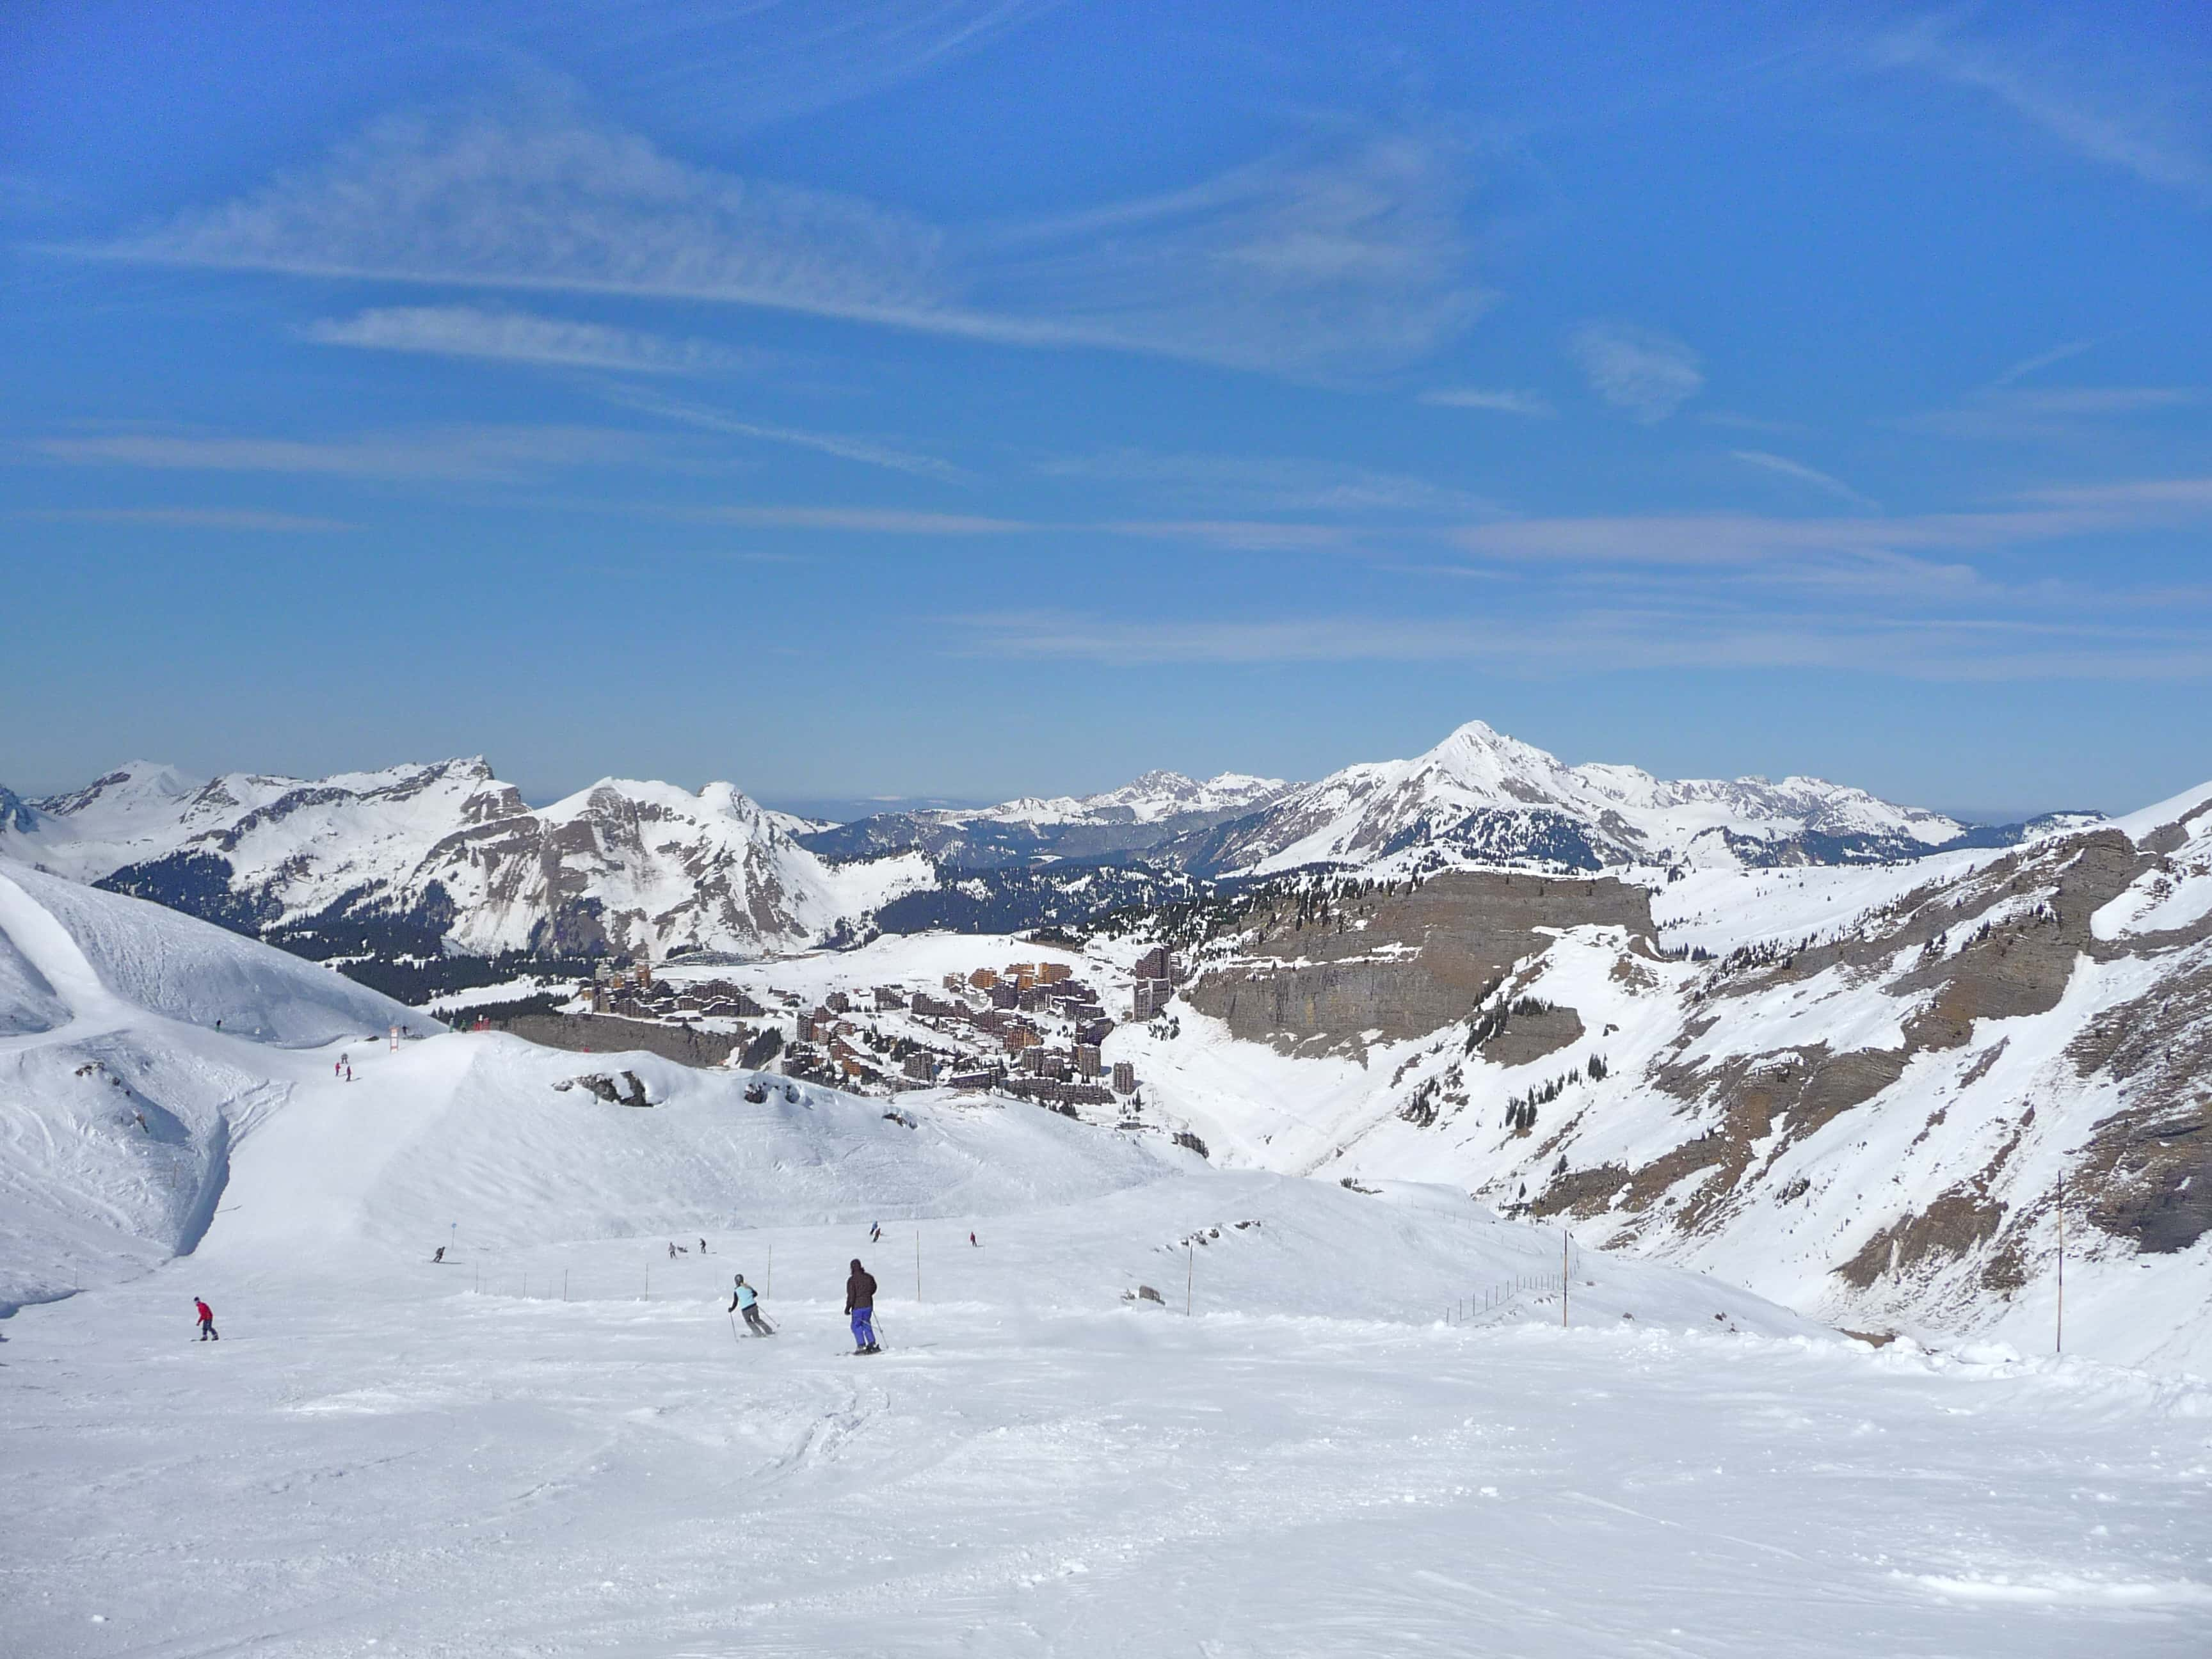 View of Avoriaz ski resort